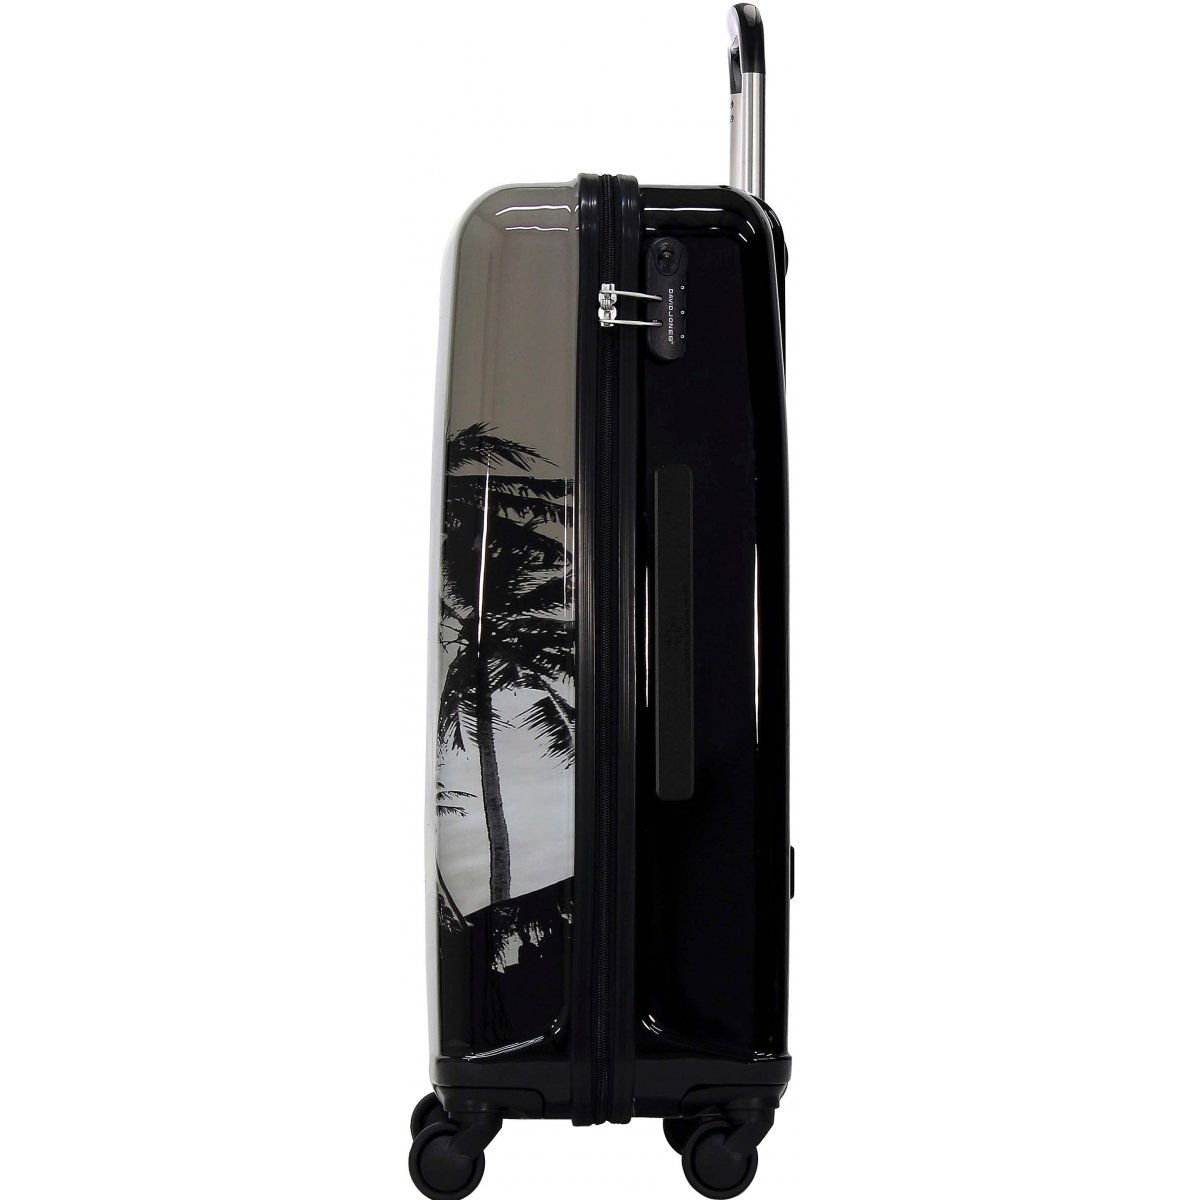 valise rigide david jones 76cm ba20581g couleur principale palmiers solde. Black Bedroom Furniture Sets. Home Design Ideas